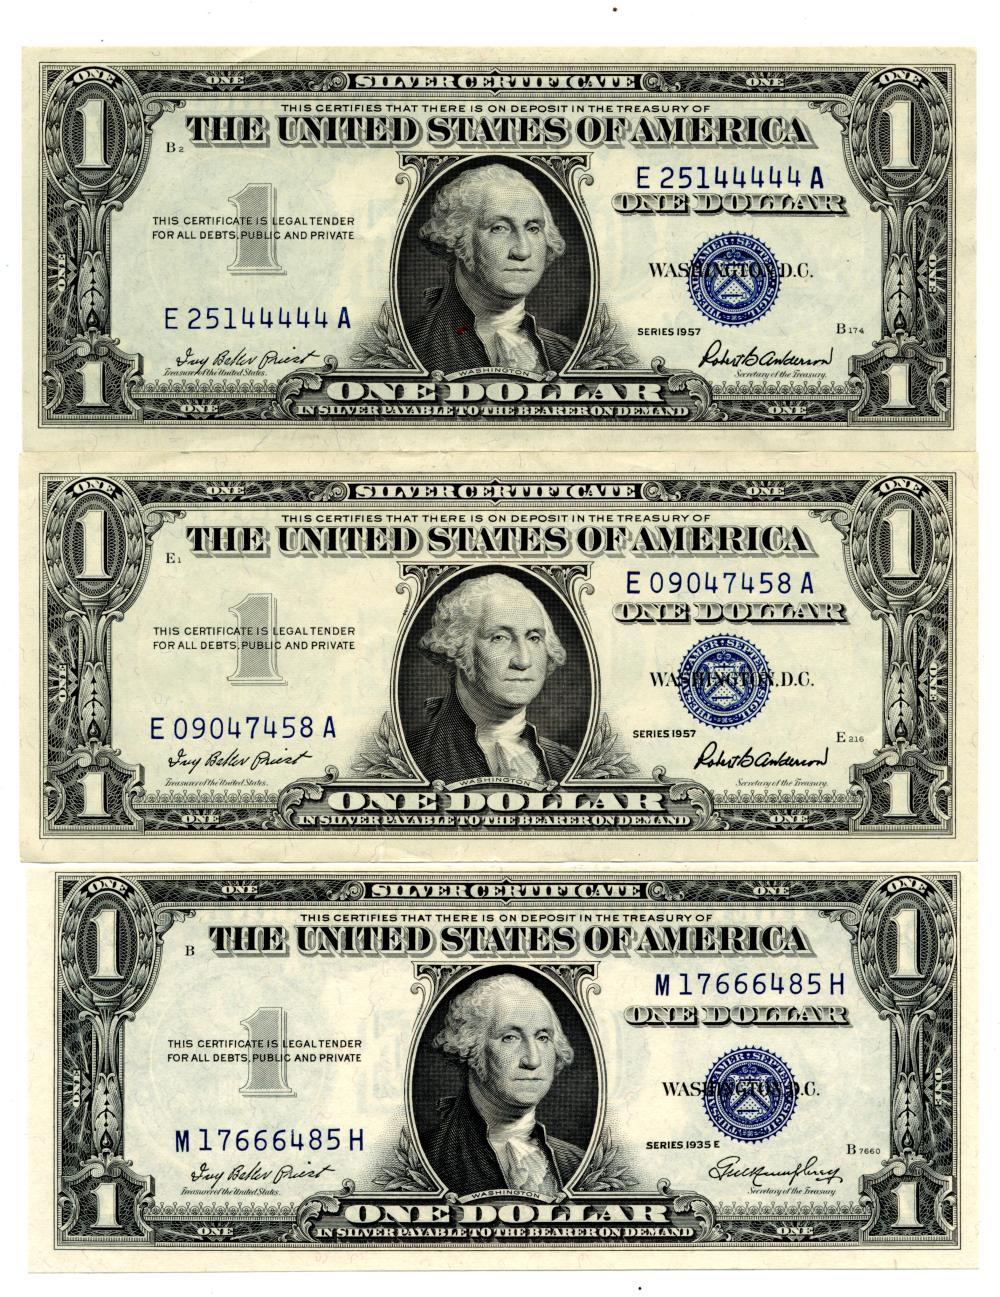 1935 E & 1957 $1.00 Silver Certificate Notes